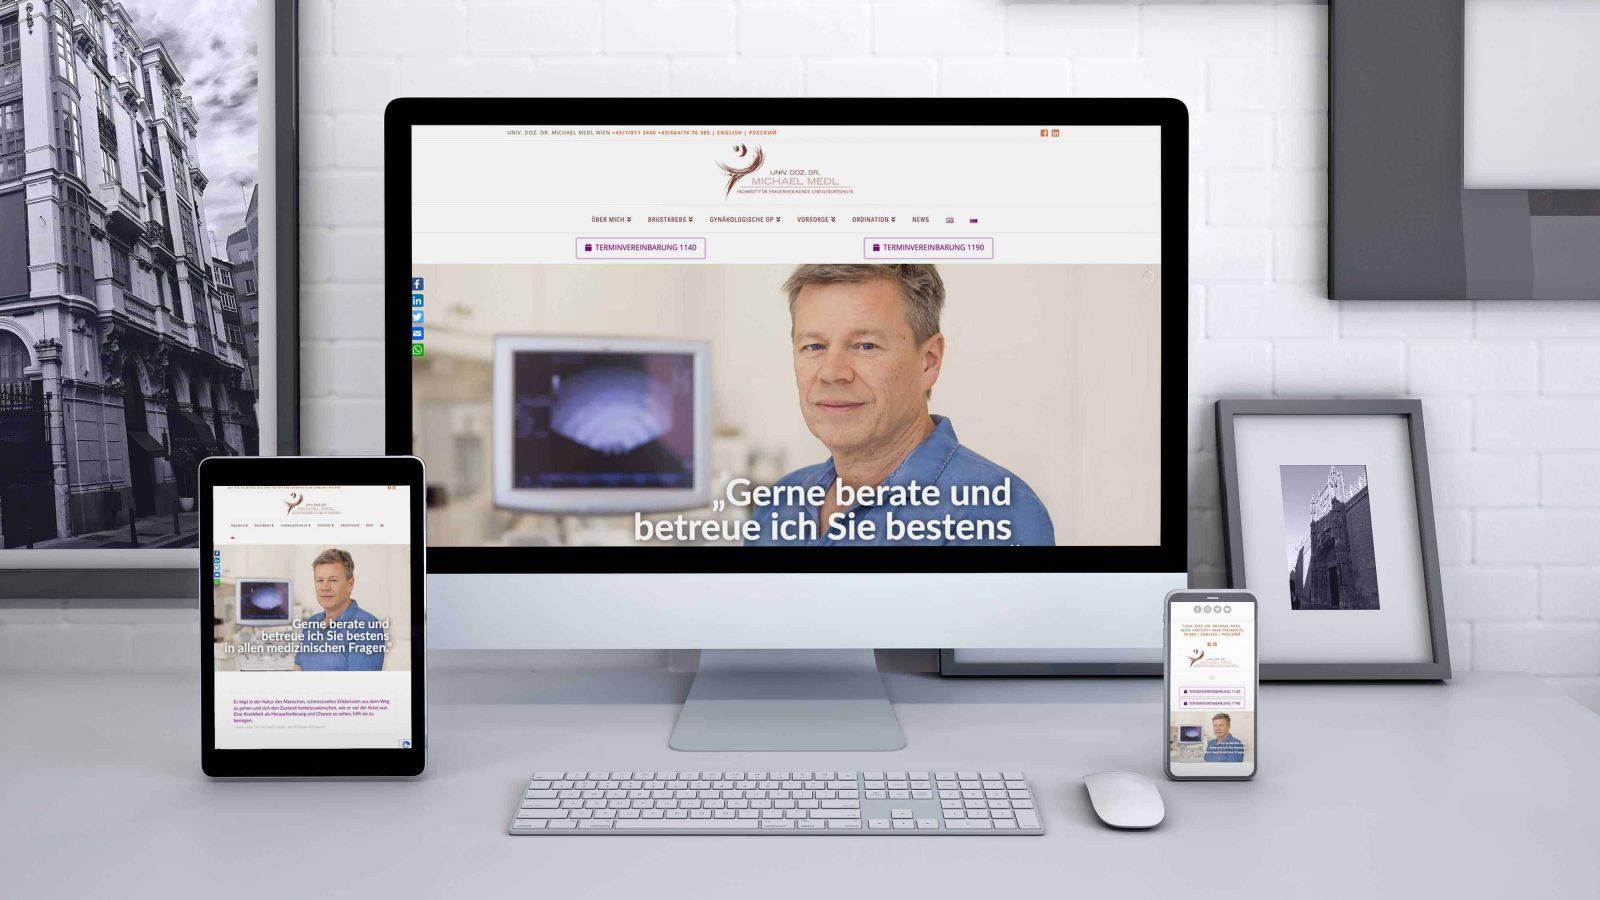 perionlineexperts-peri-onlineexperts-agentur-onlineagentur-internetpraesenz-social-media-socialmedia-mockup-medl-website